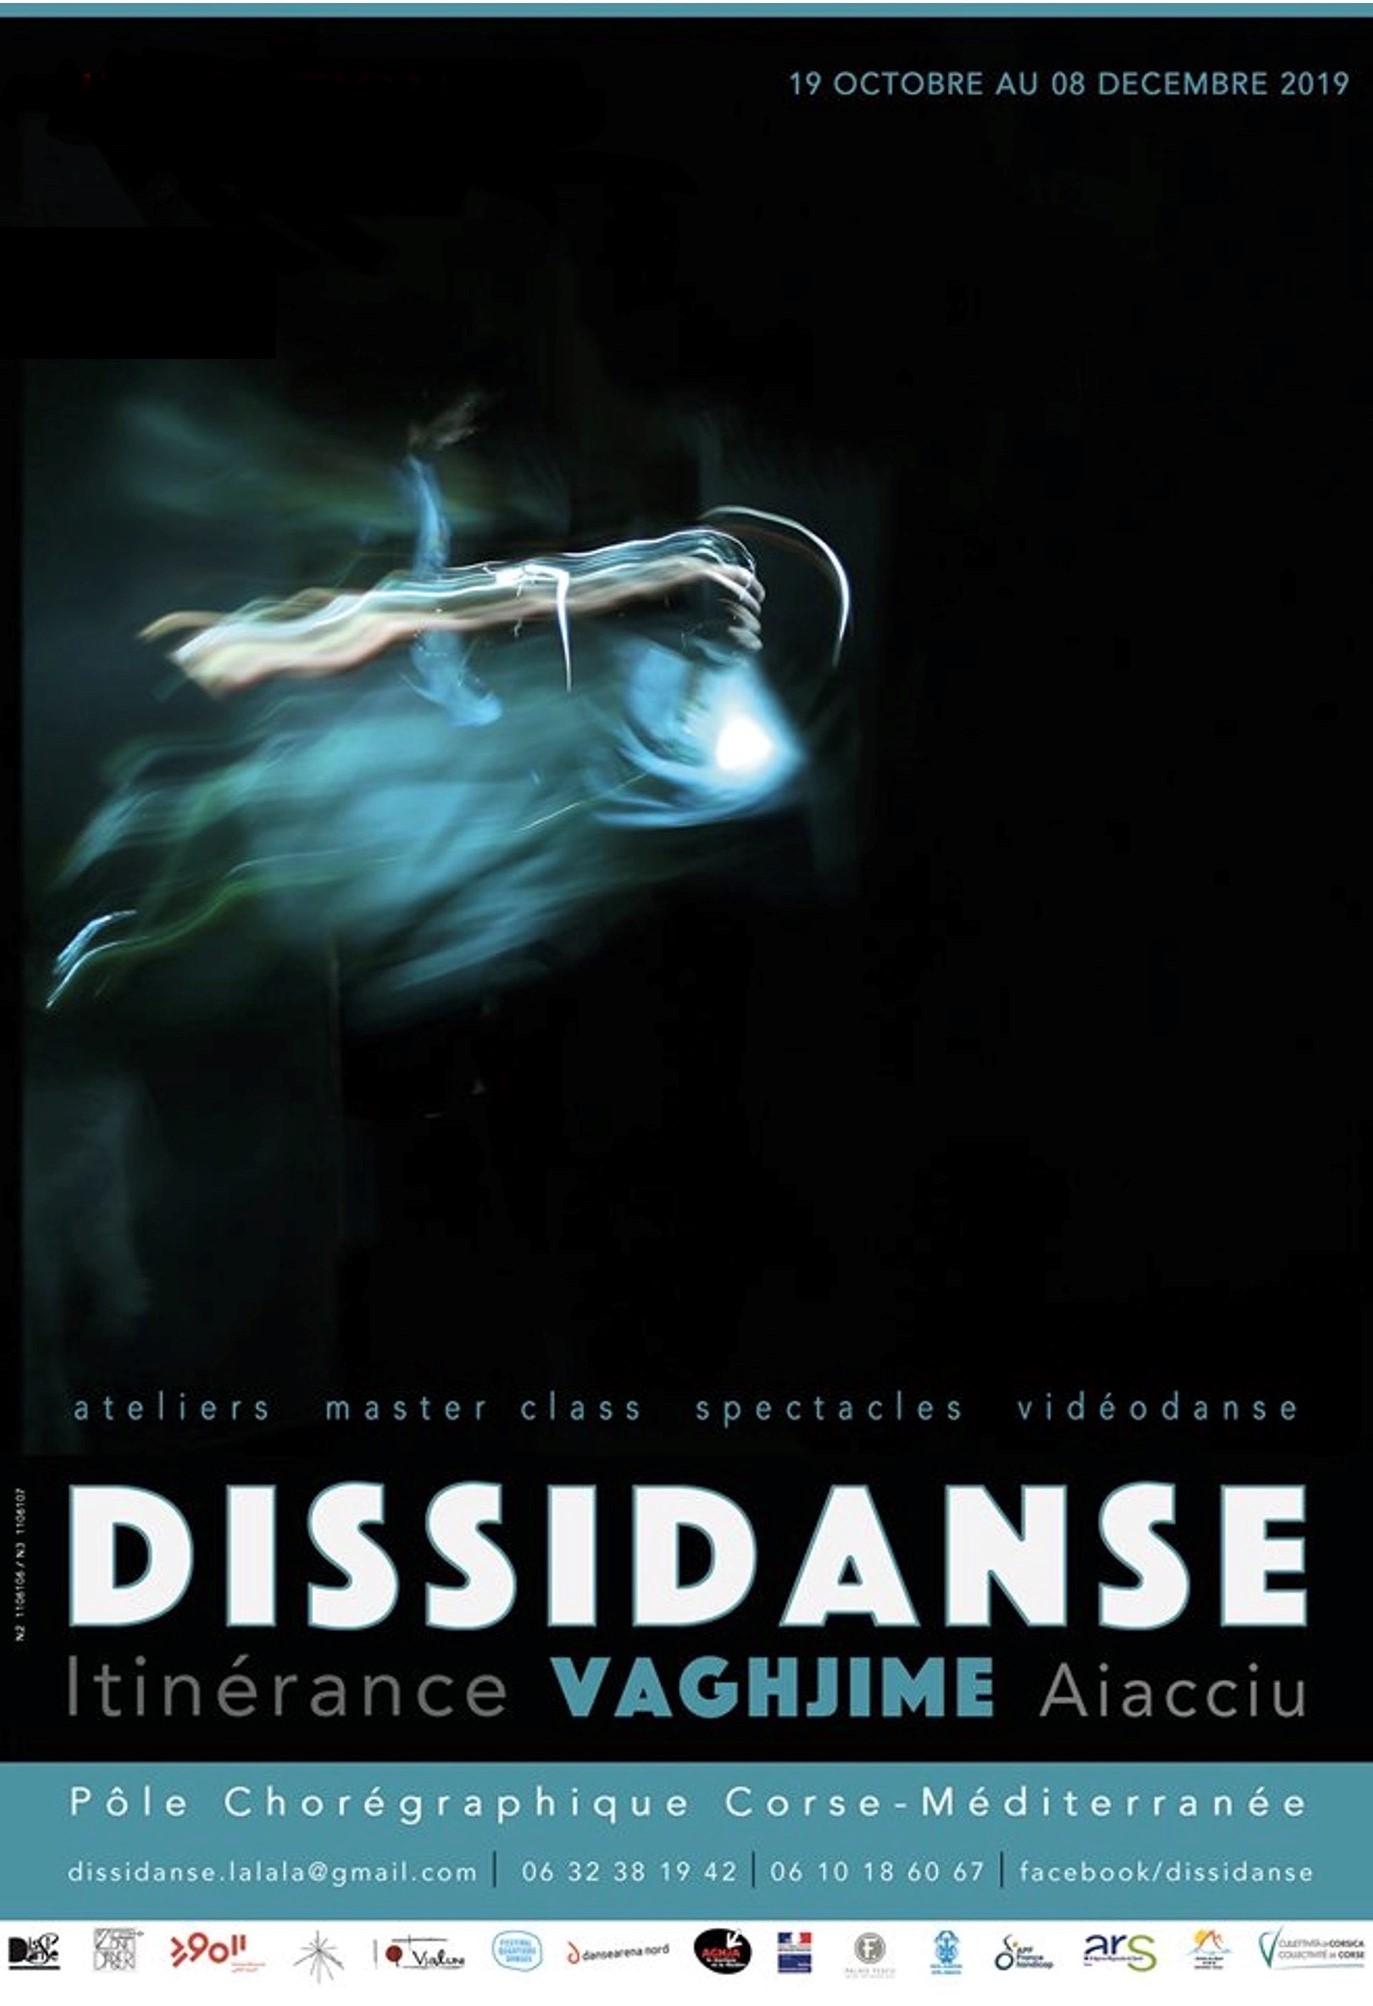 Festival DISSIDANSE Itinérance VAGHJIME